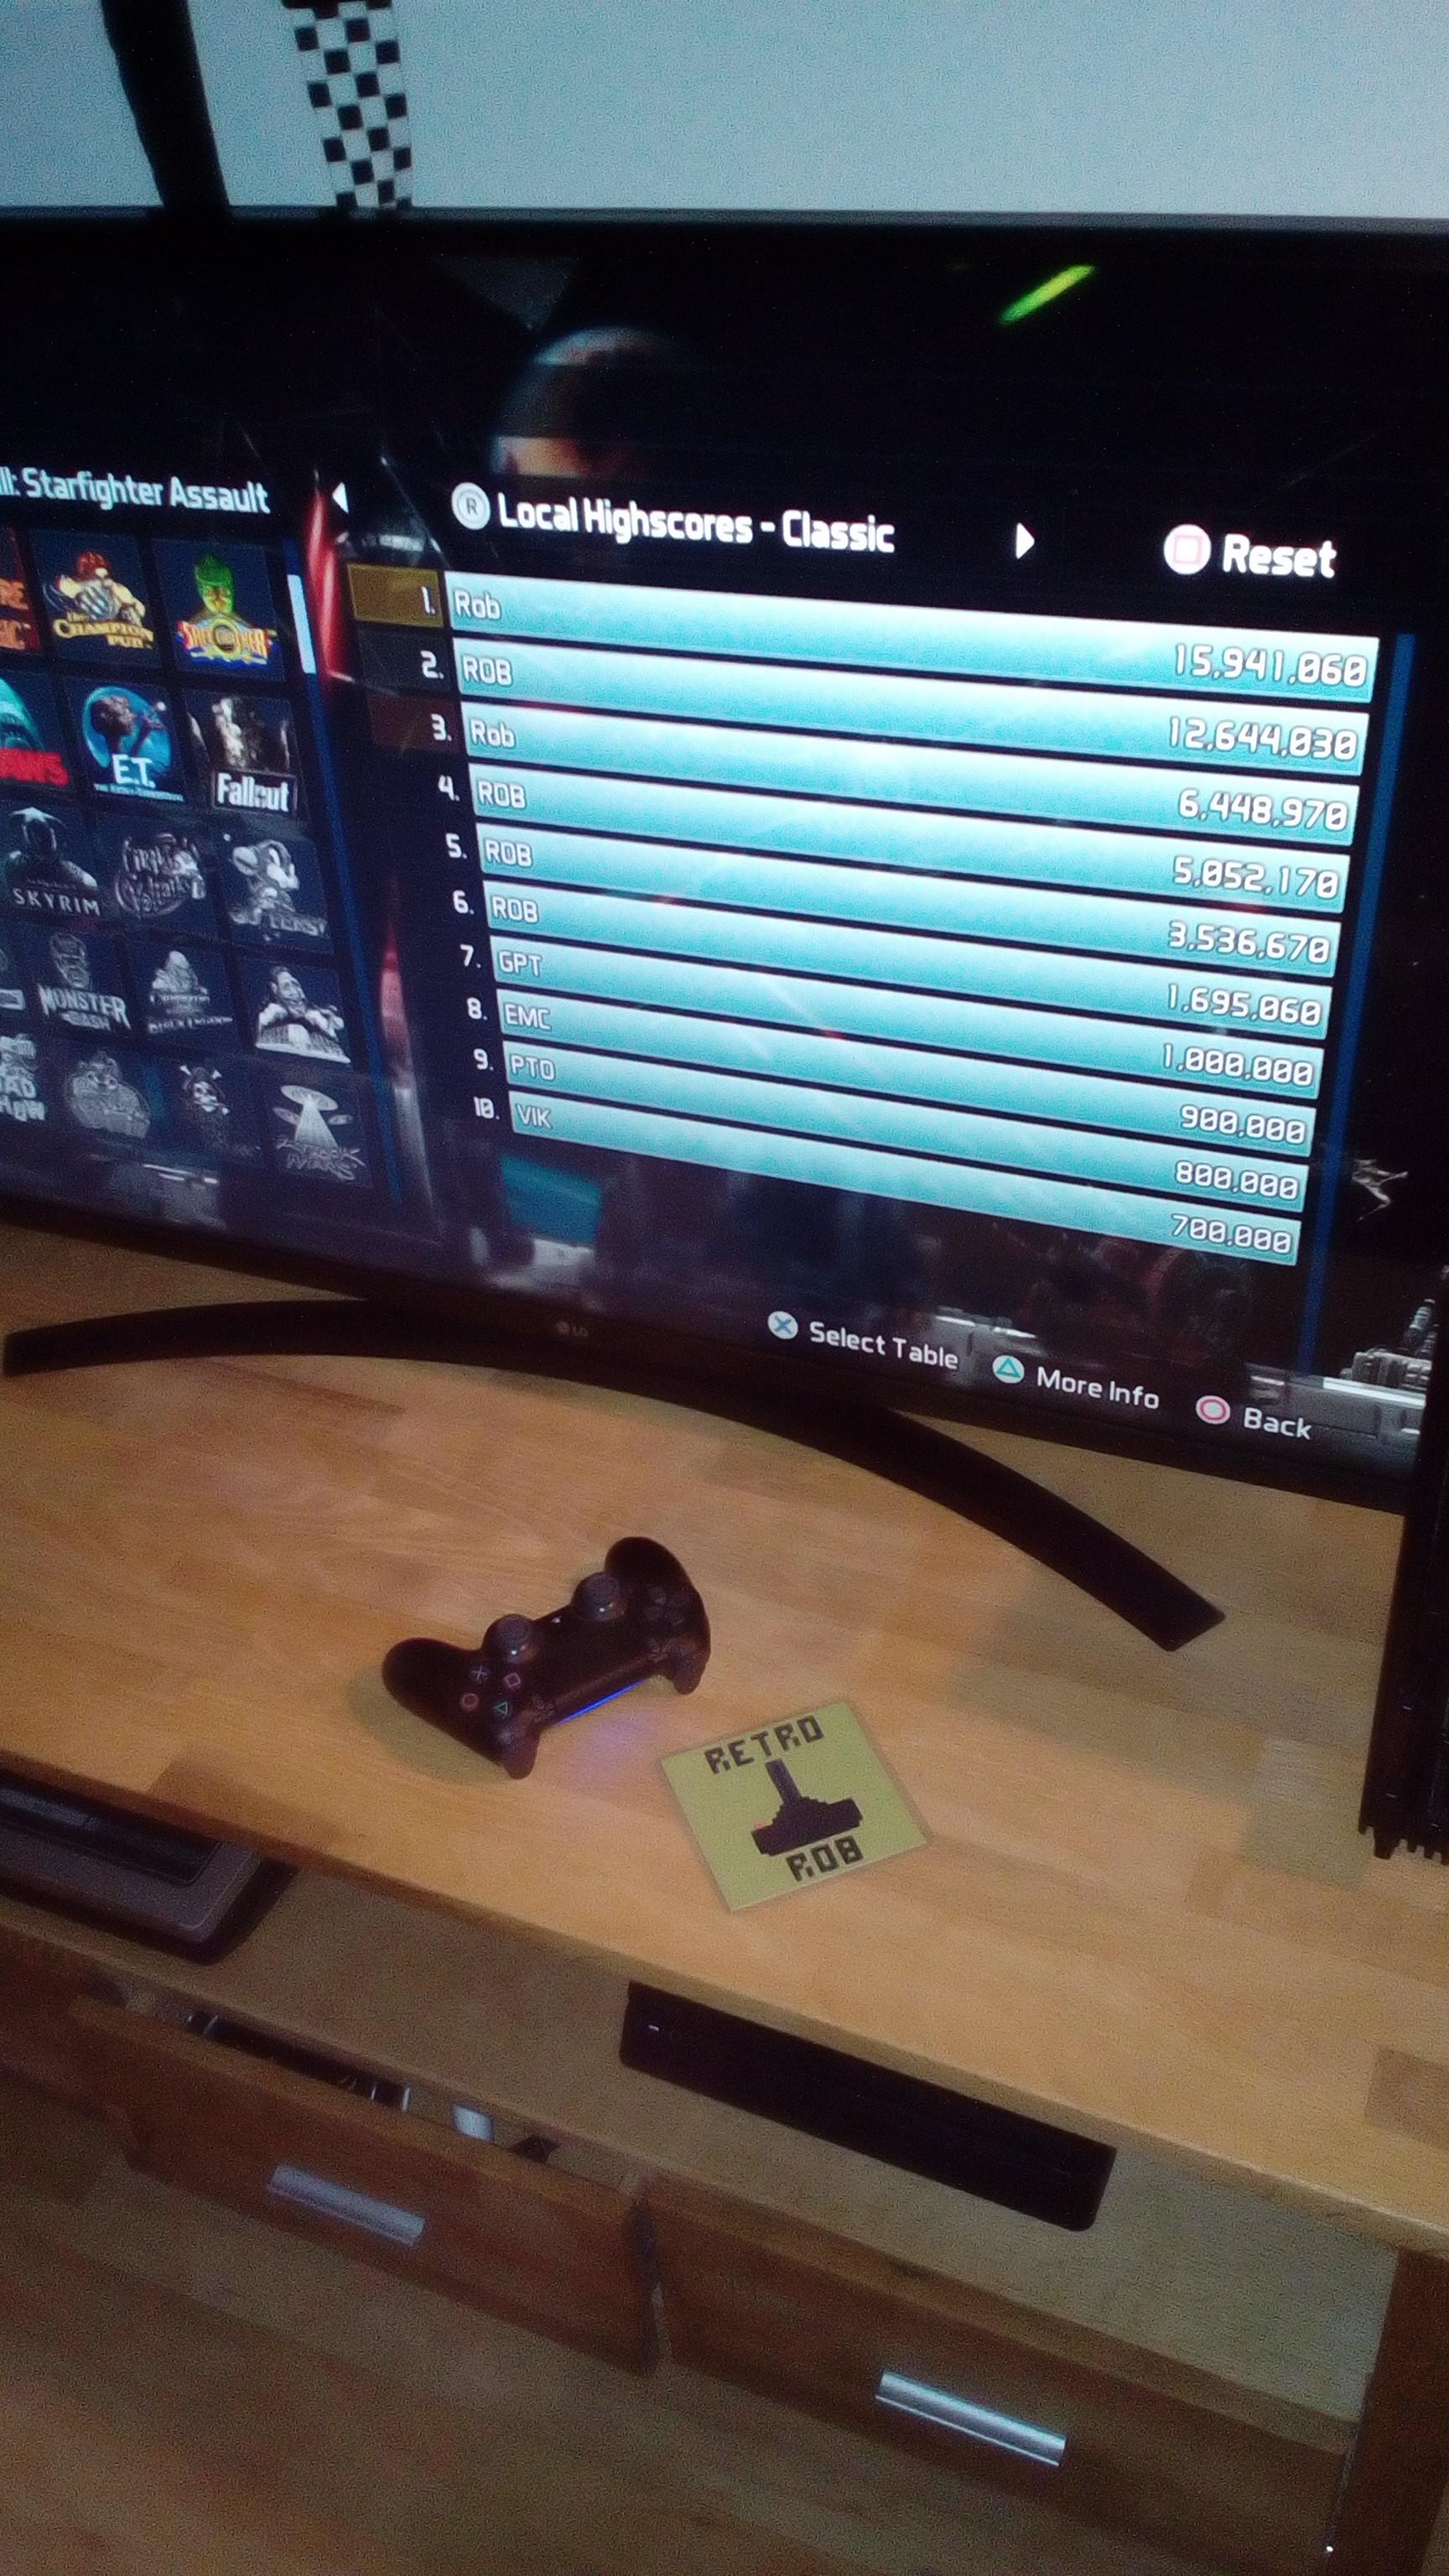 RetroRob: Pinball FX3: Star Wars Pinball: Starfighter Assault [Classic] (Playstation 4) 15,941,060 points on 2020-08-10 05:28:50